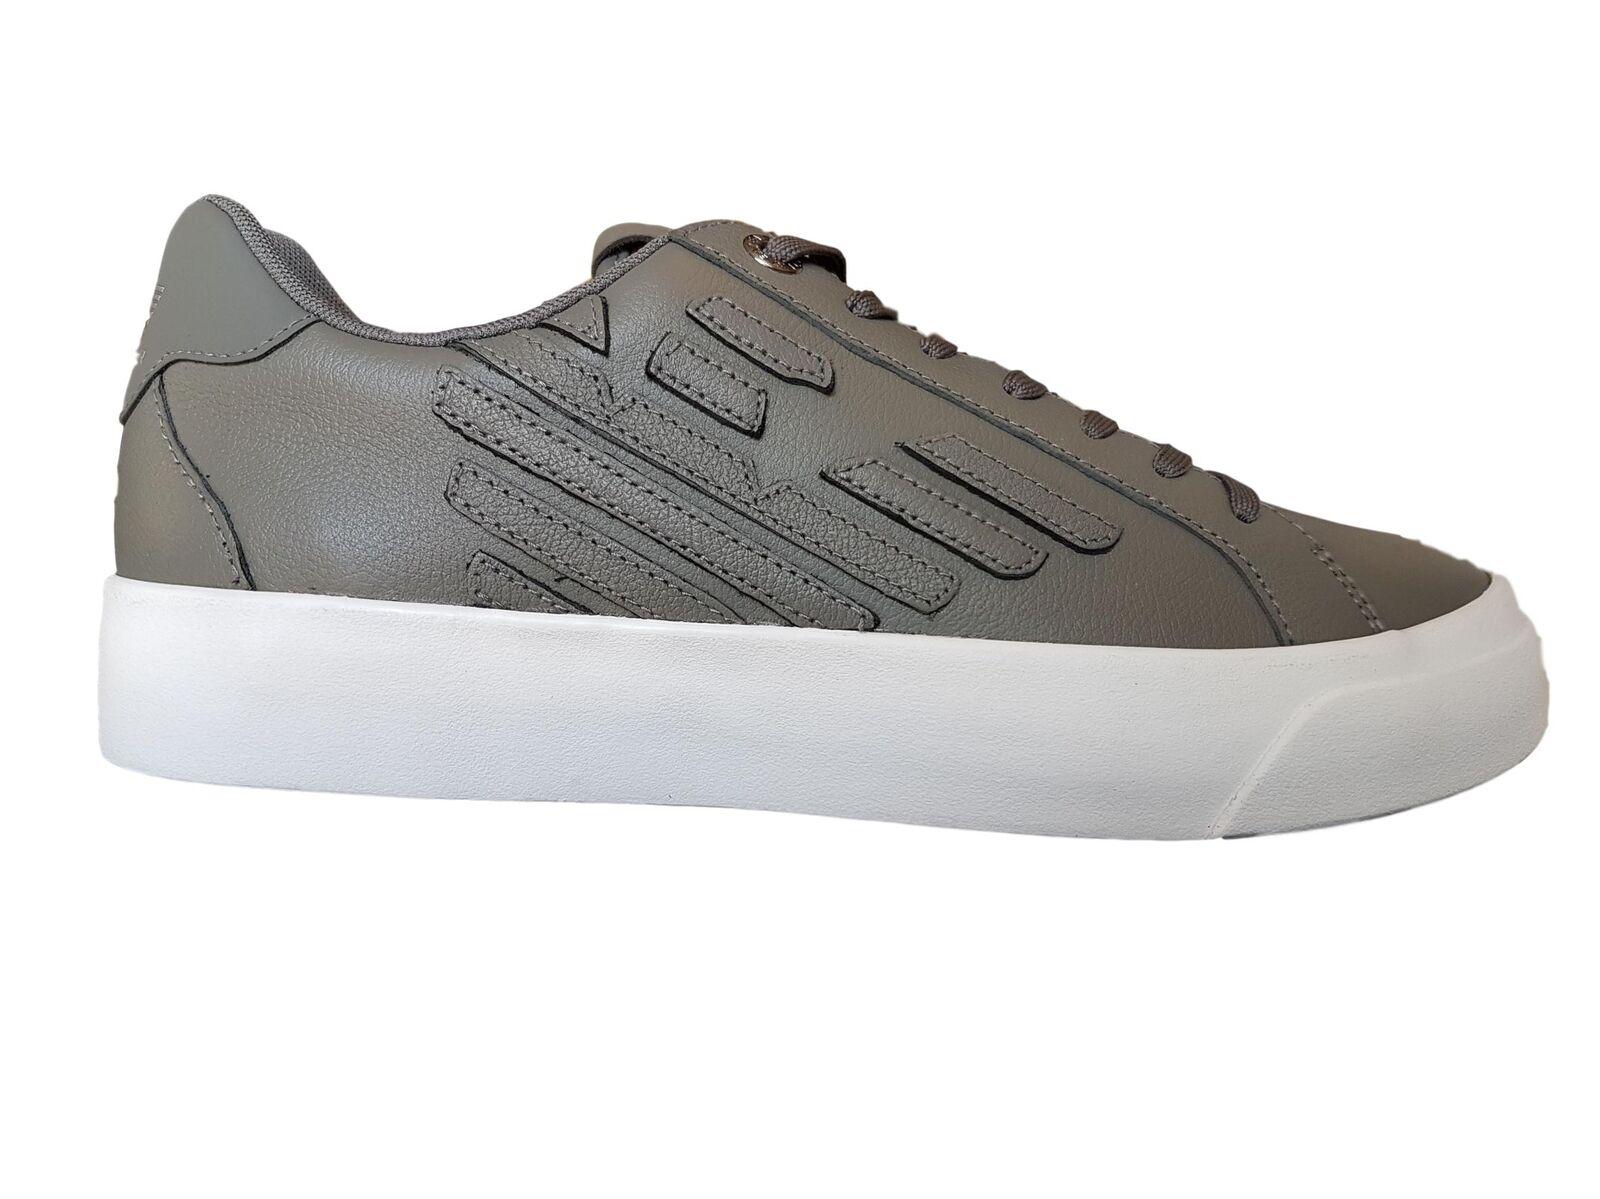 ccca6a47e688 shoes EA7 Emporio Armani 7 EA Man X8X004 Sneakers Grey Leather Sport Logo F  W 18